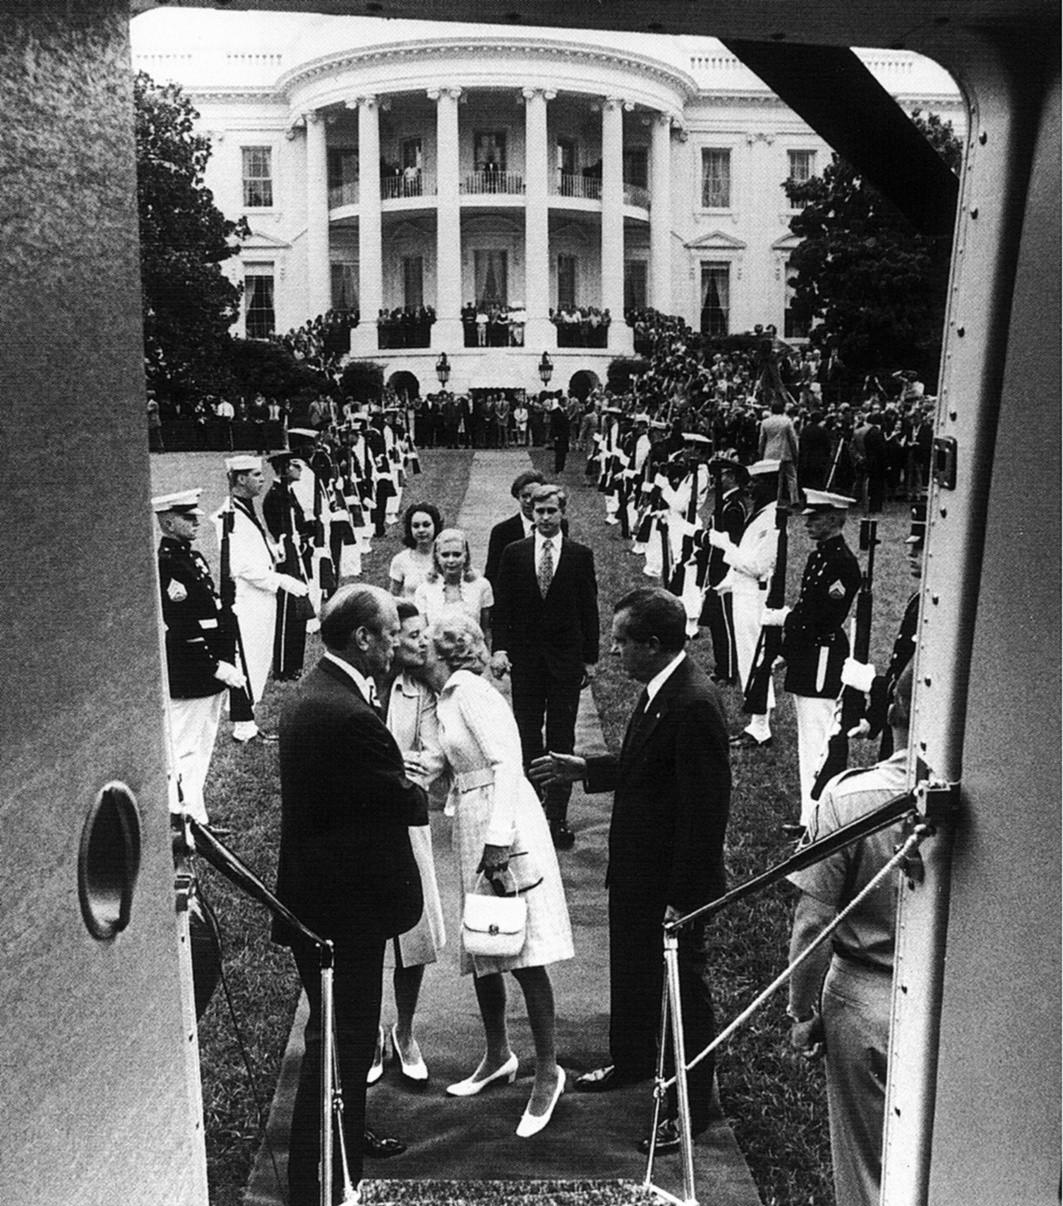 60-second history: Watergate (Public Domain)